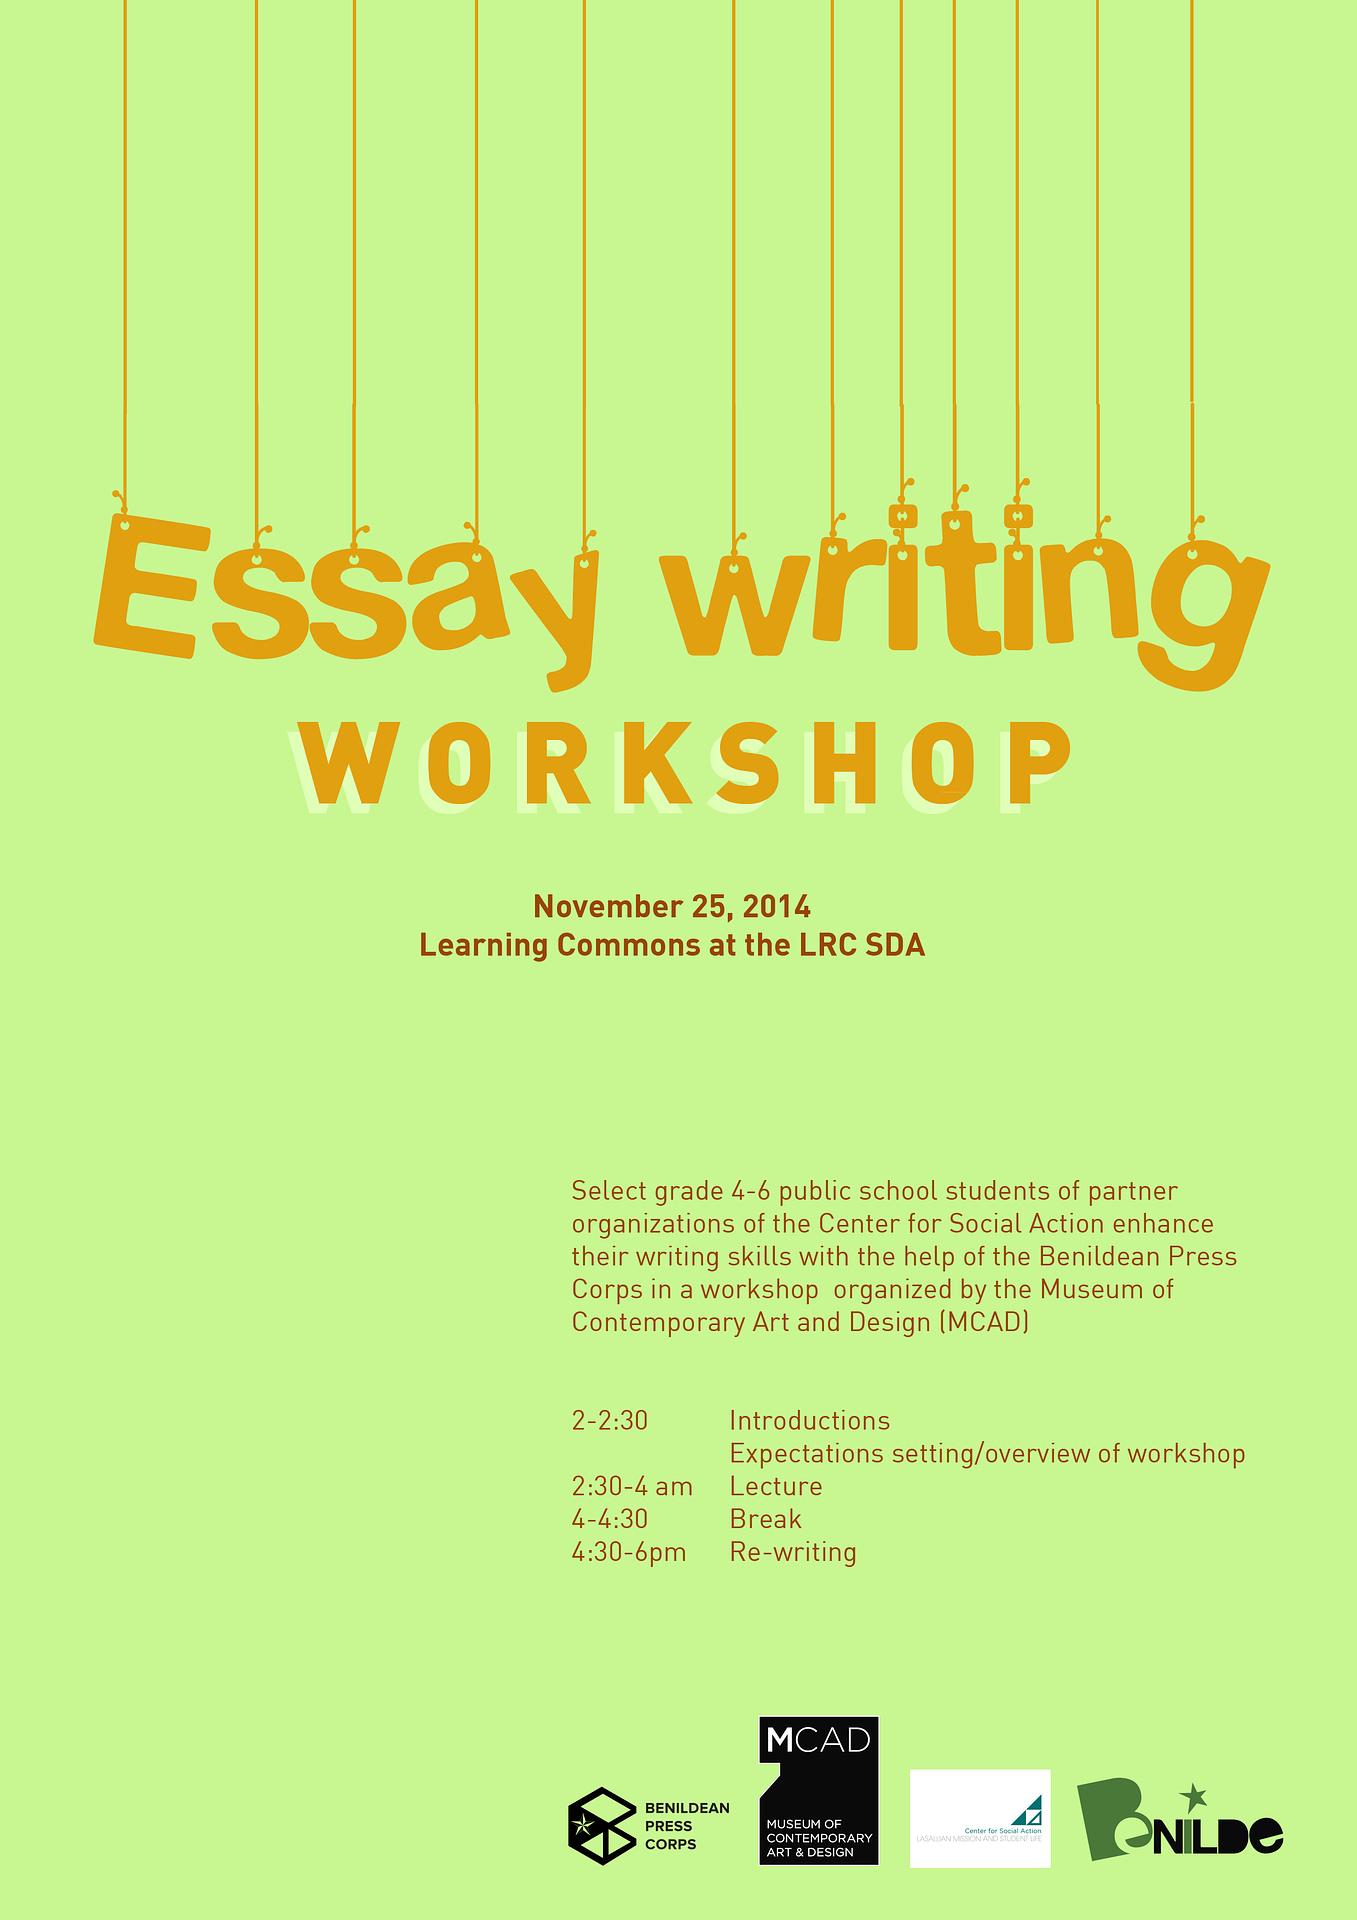 A103 essays